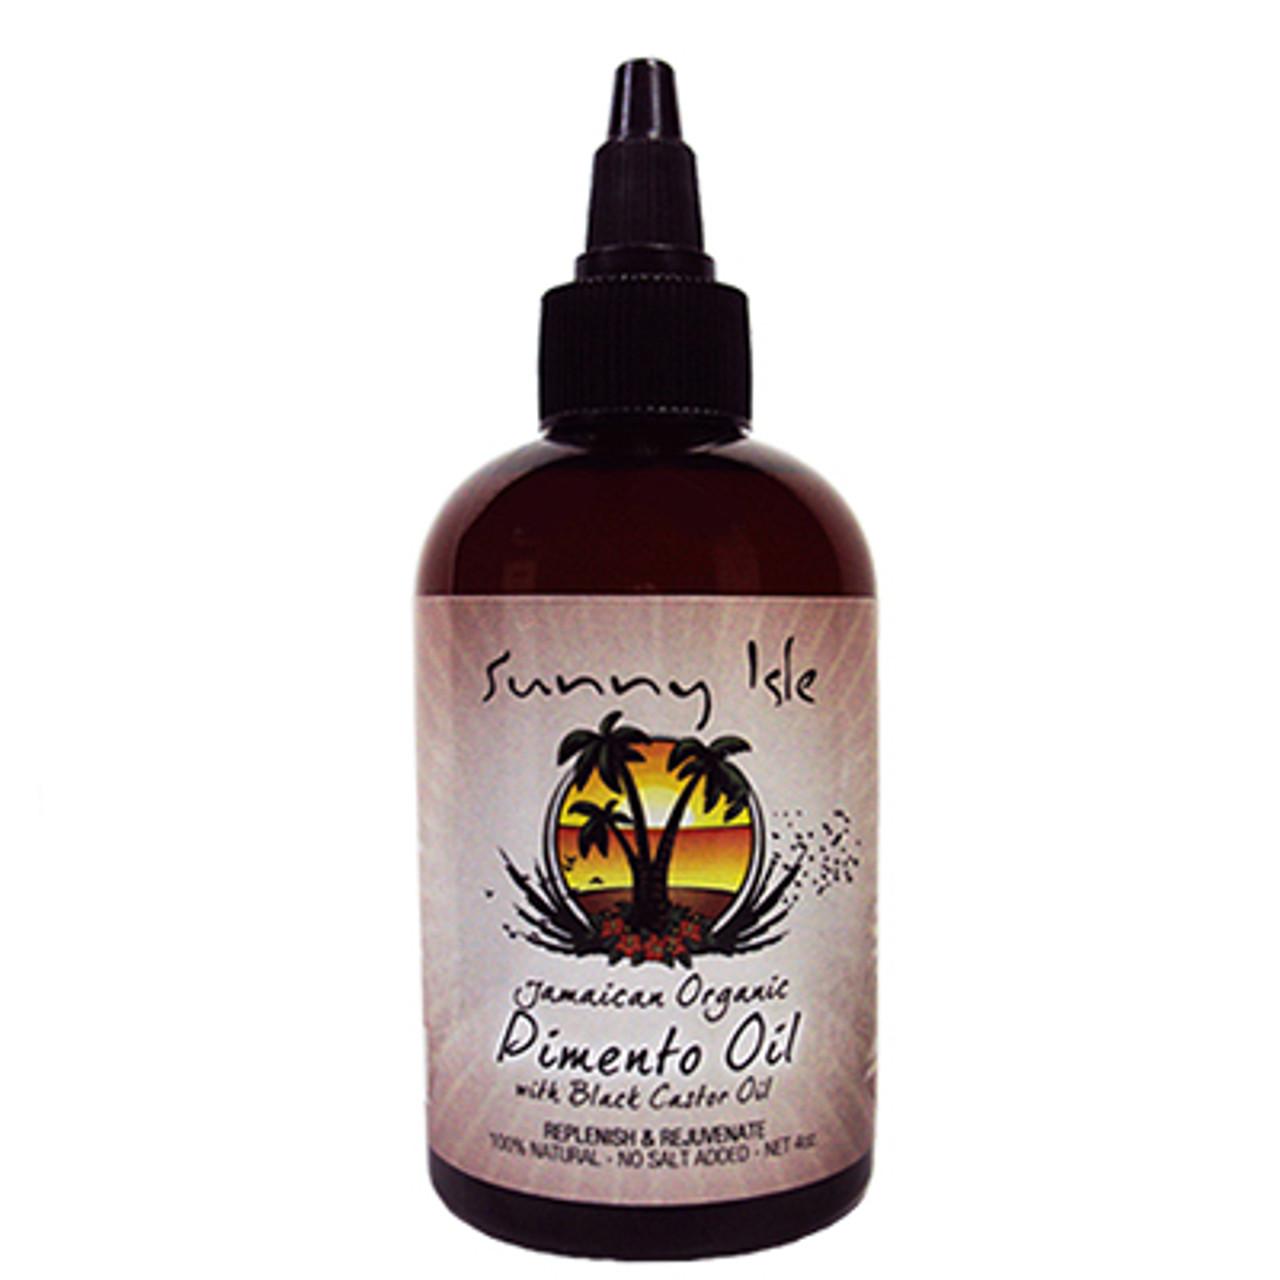 Jamaican Organic Pimento Oil with Black Castor Oil 4 Oz